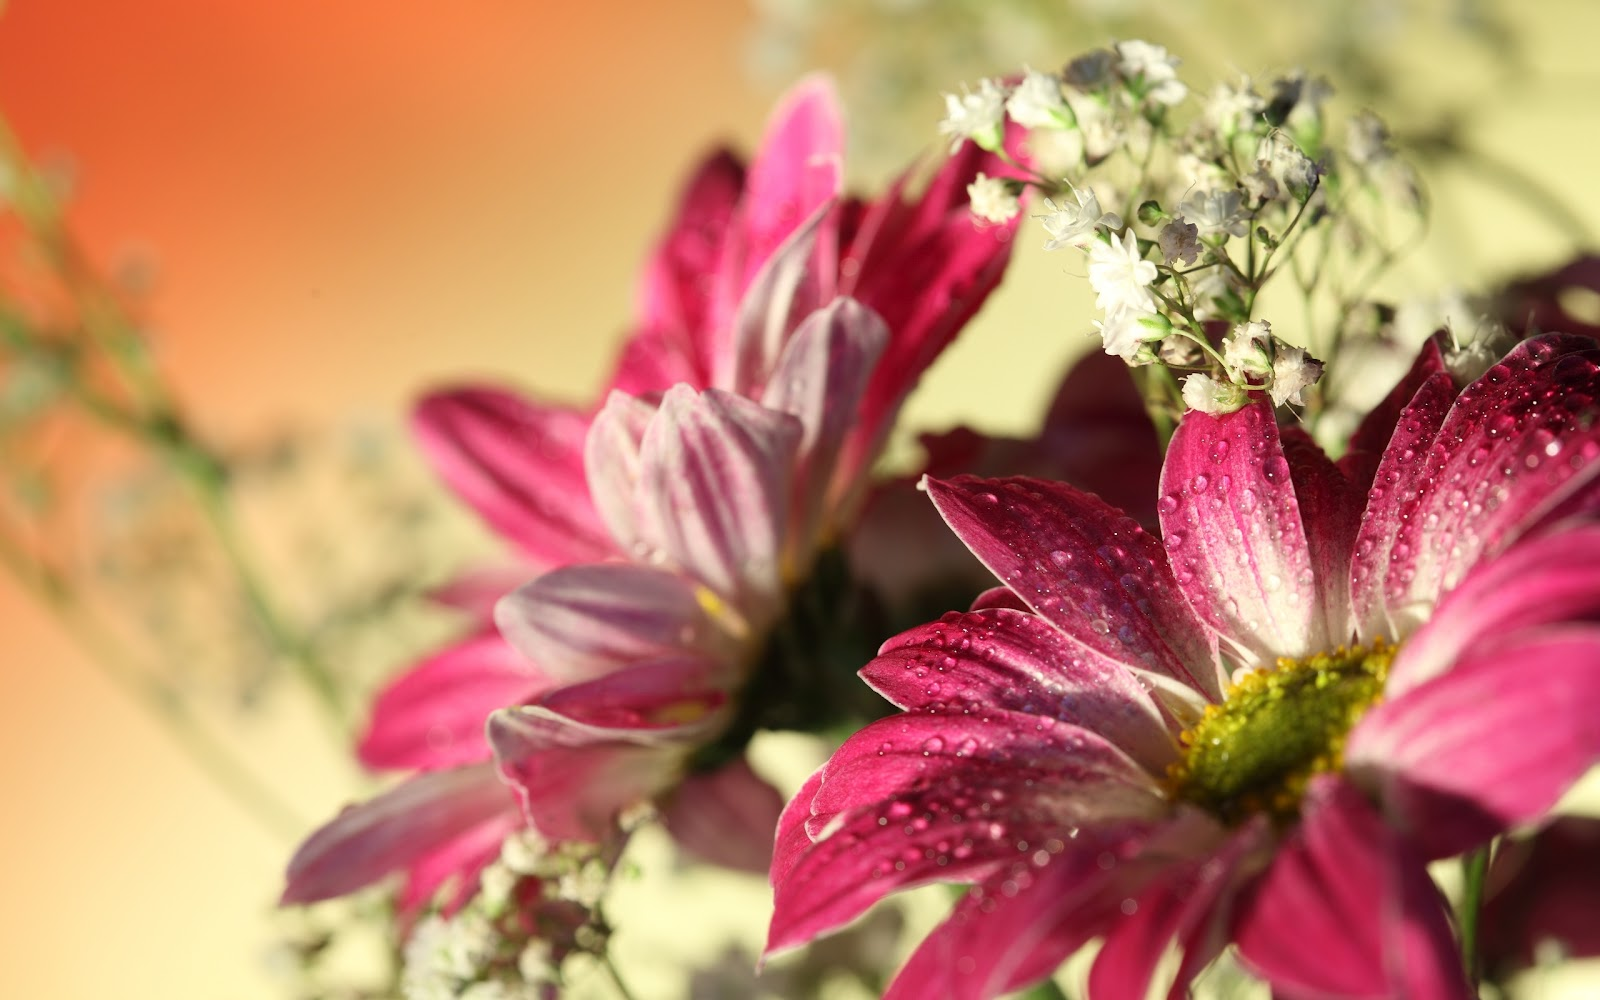 Fondos de Hermosas flores | Fondos de pantalla de Hermosas